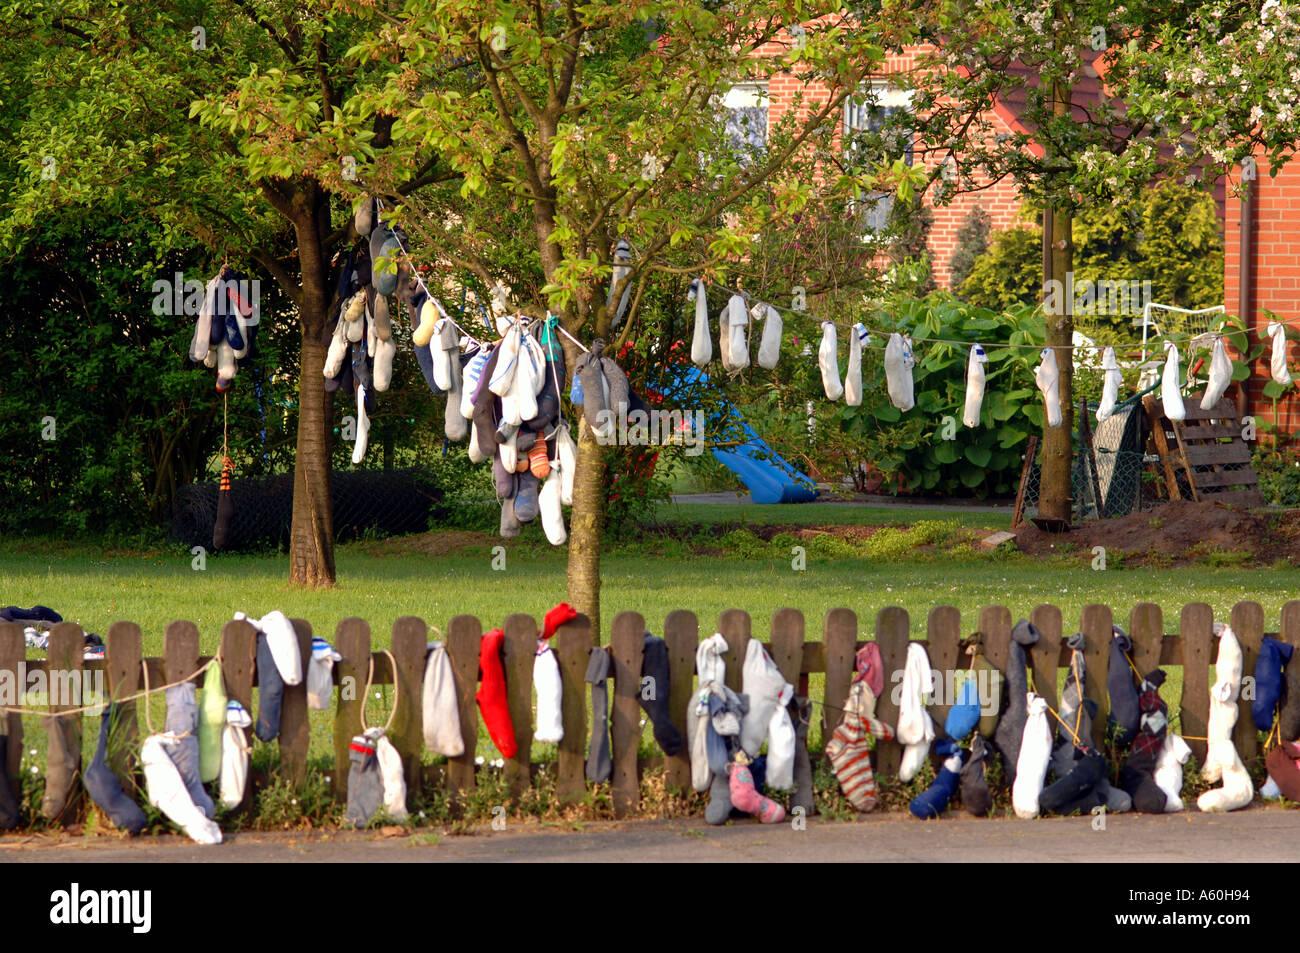 Deutsche Tradition Socken 25 Geburtstag Stockfoto Bild